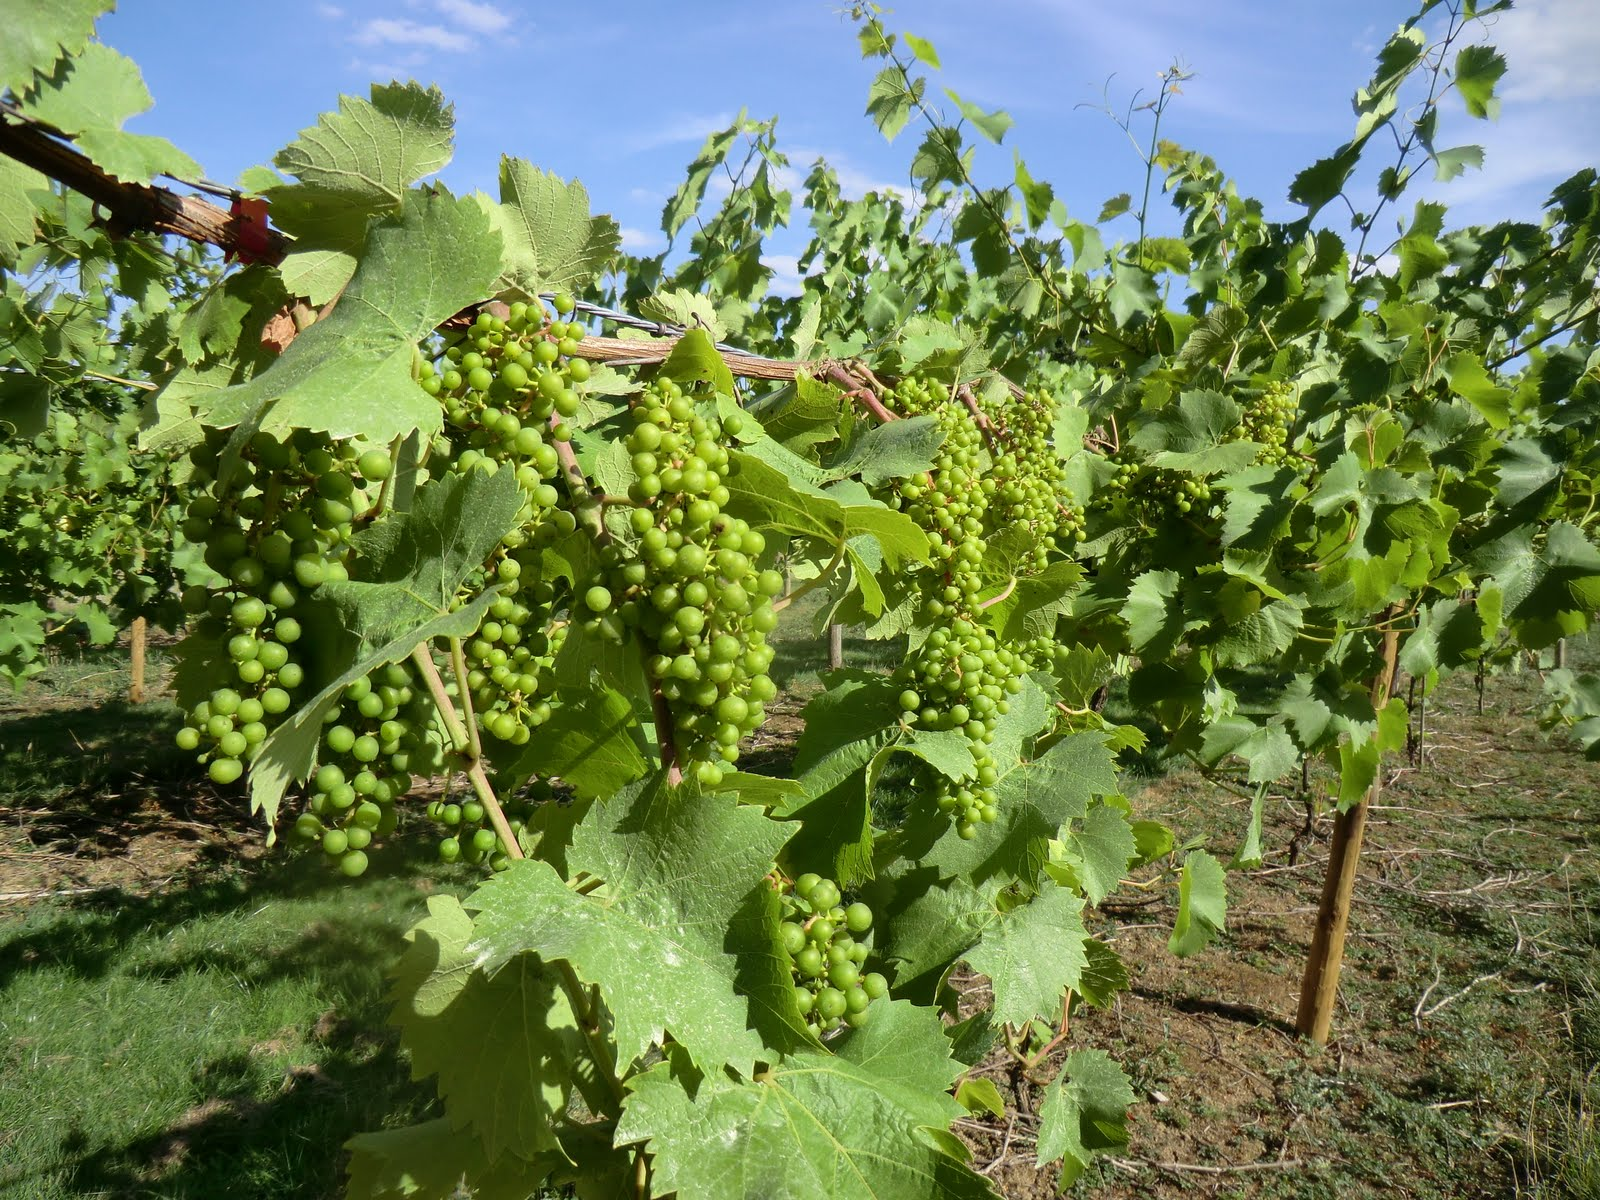 CIMG8439 Harden Vineyard in August